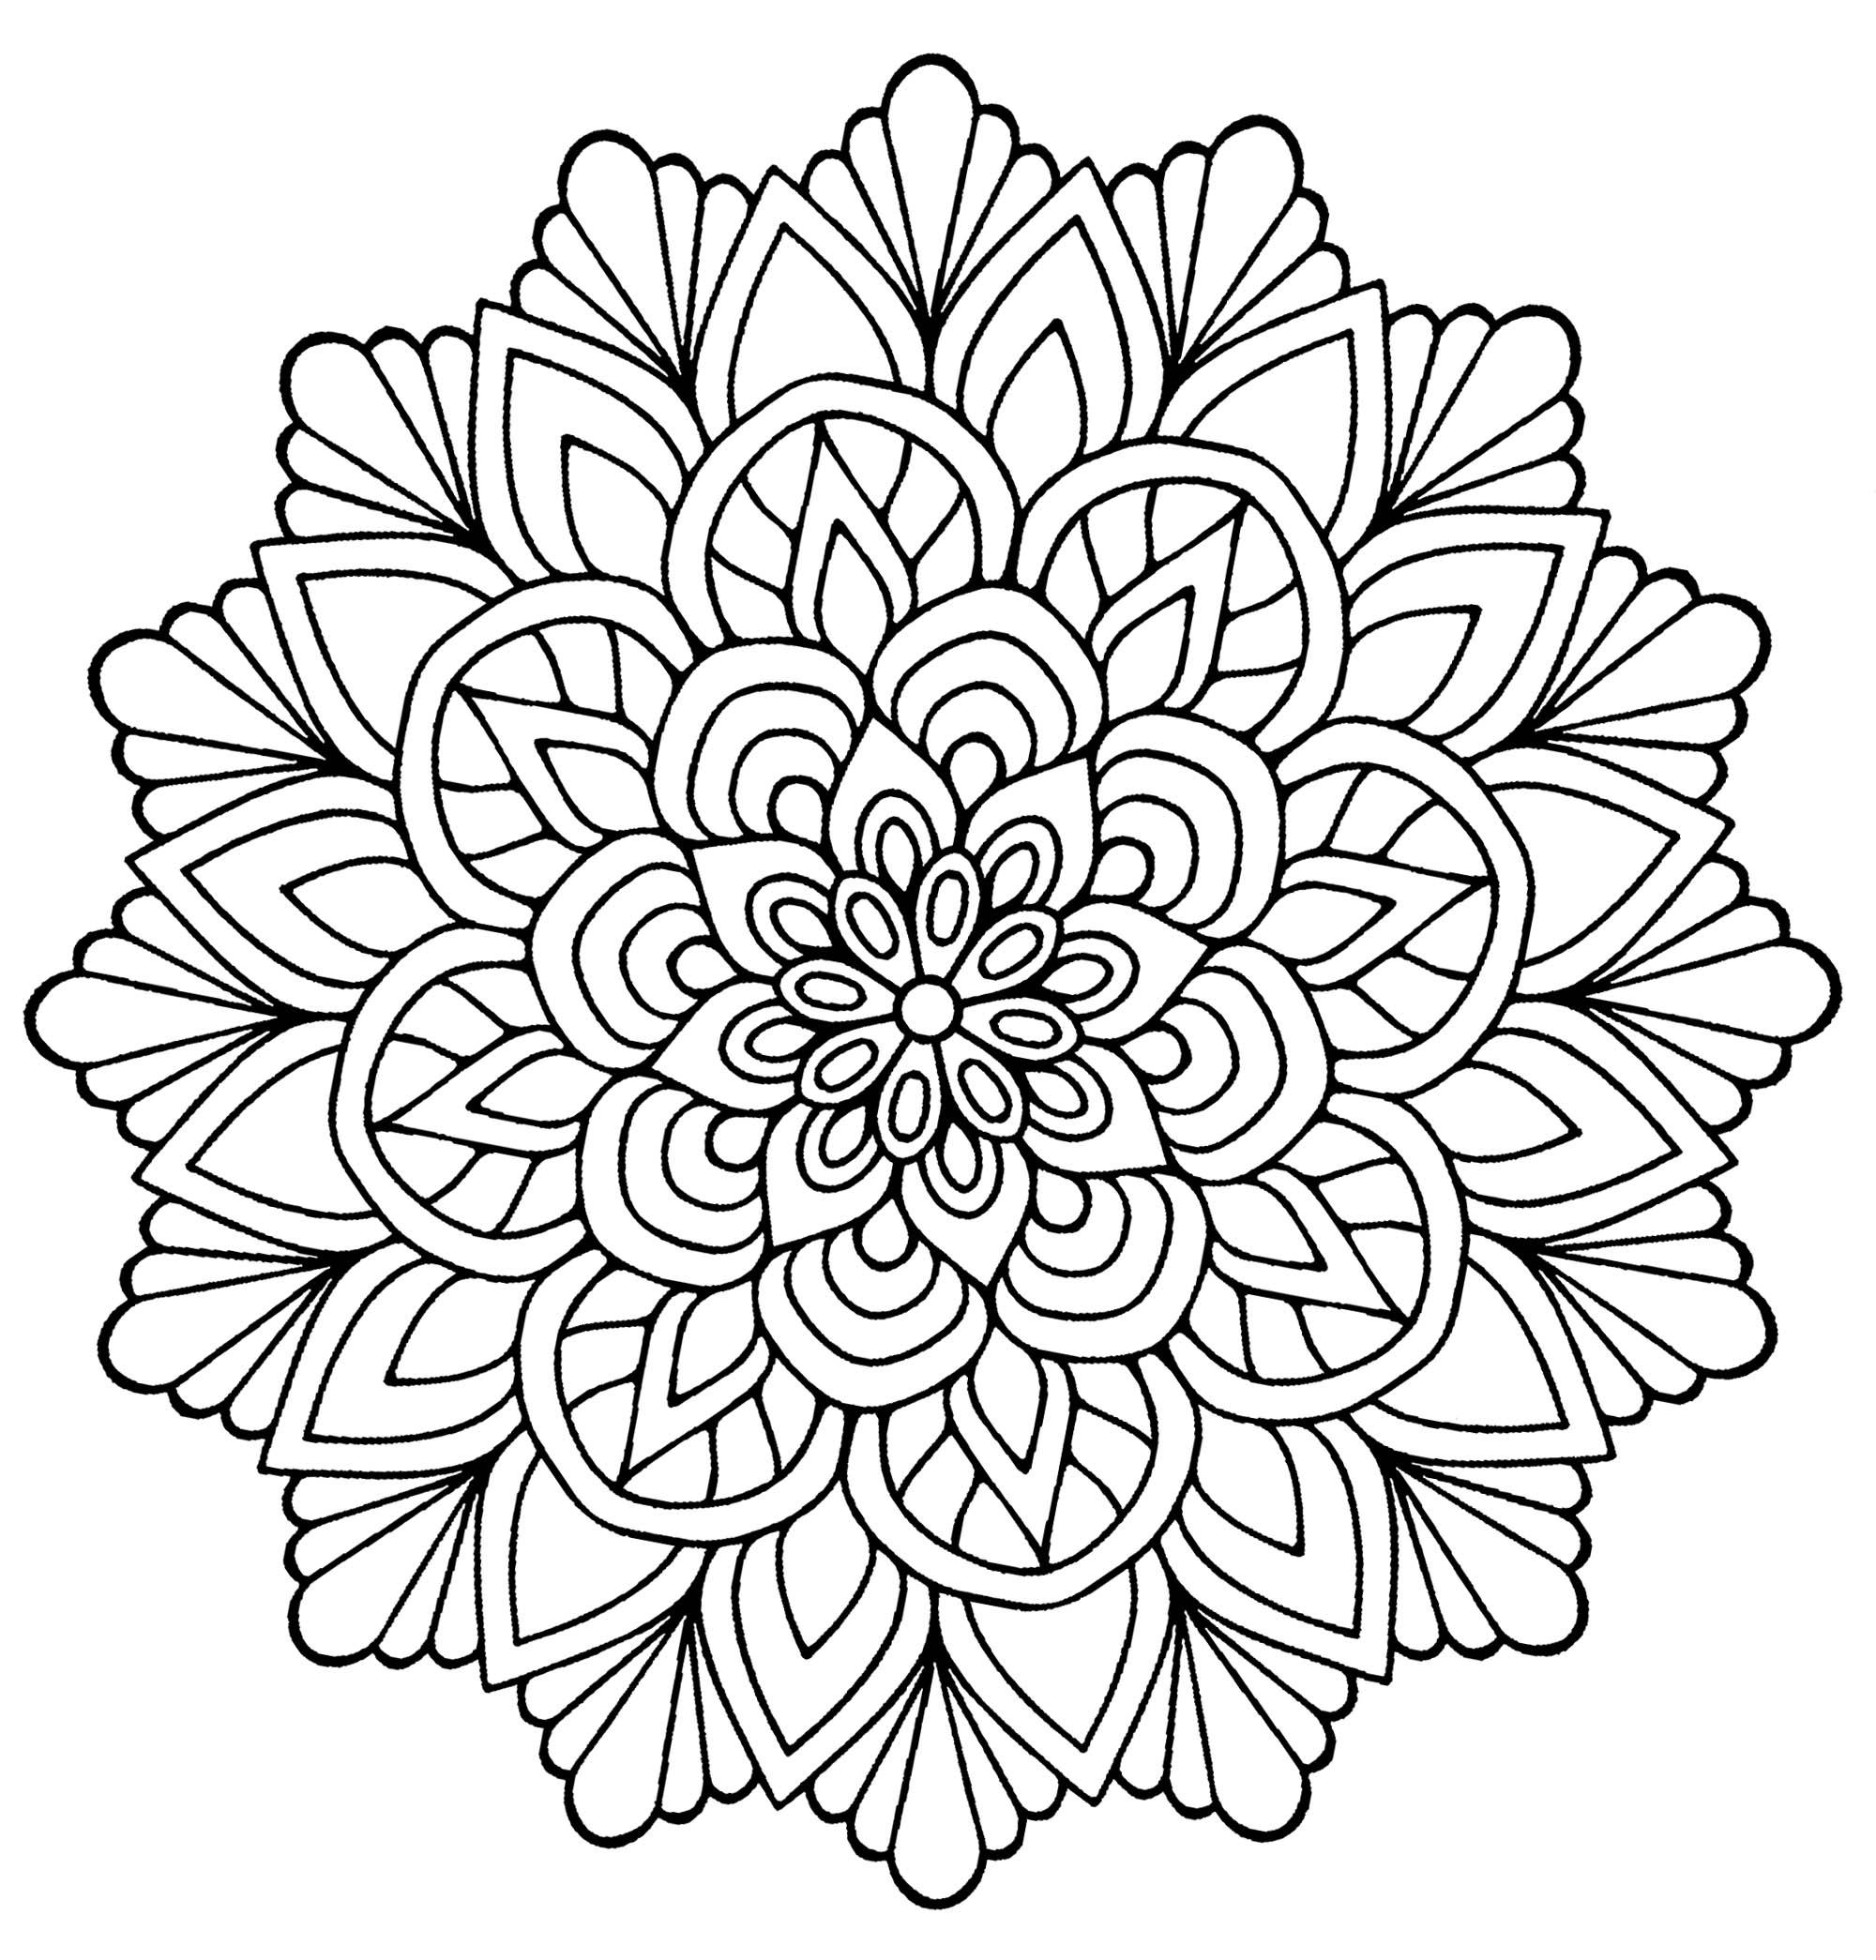 Mandalas for children - Mandalas Kids Coloring Pages